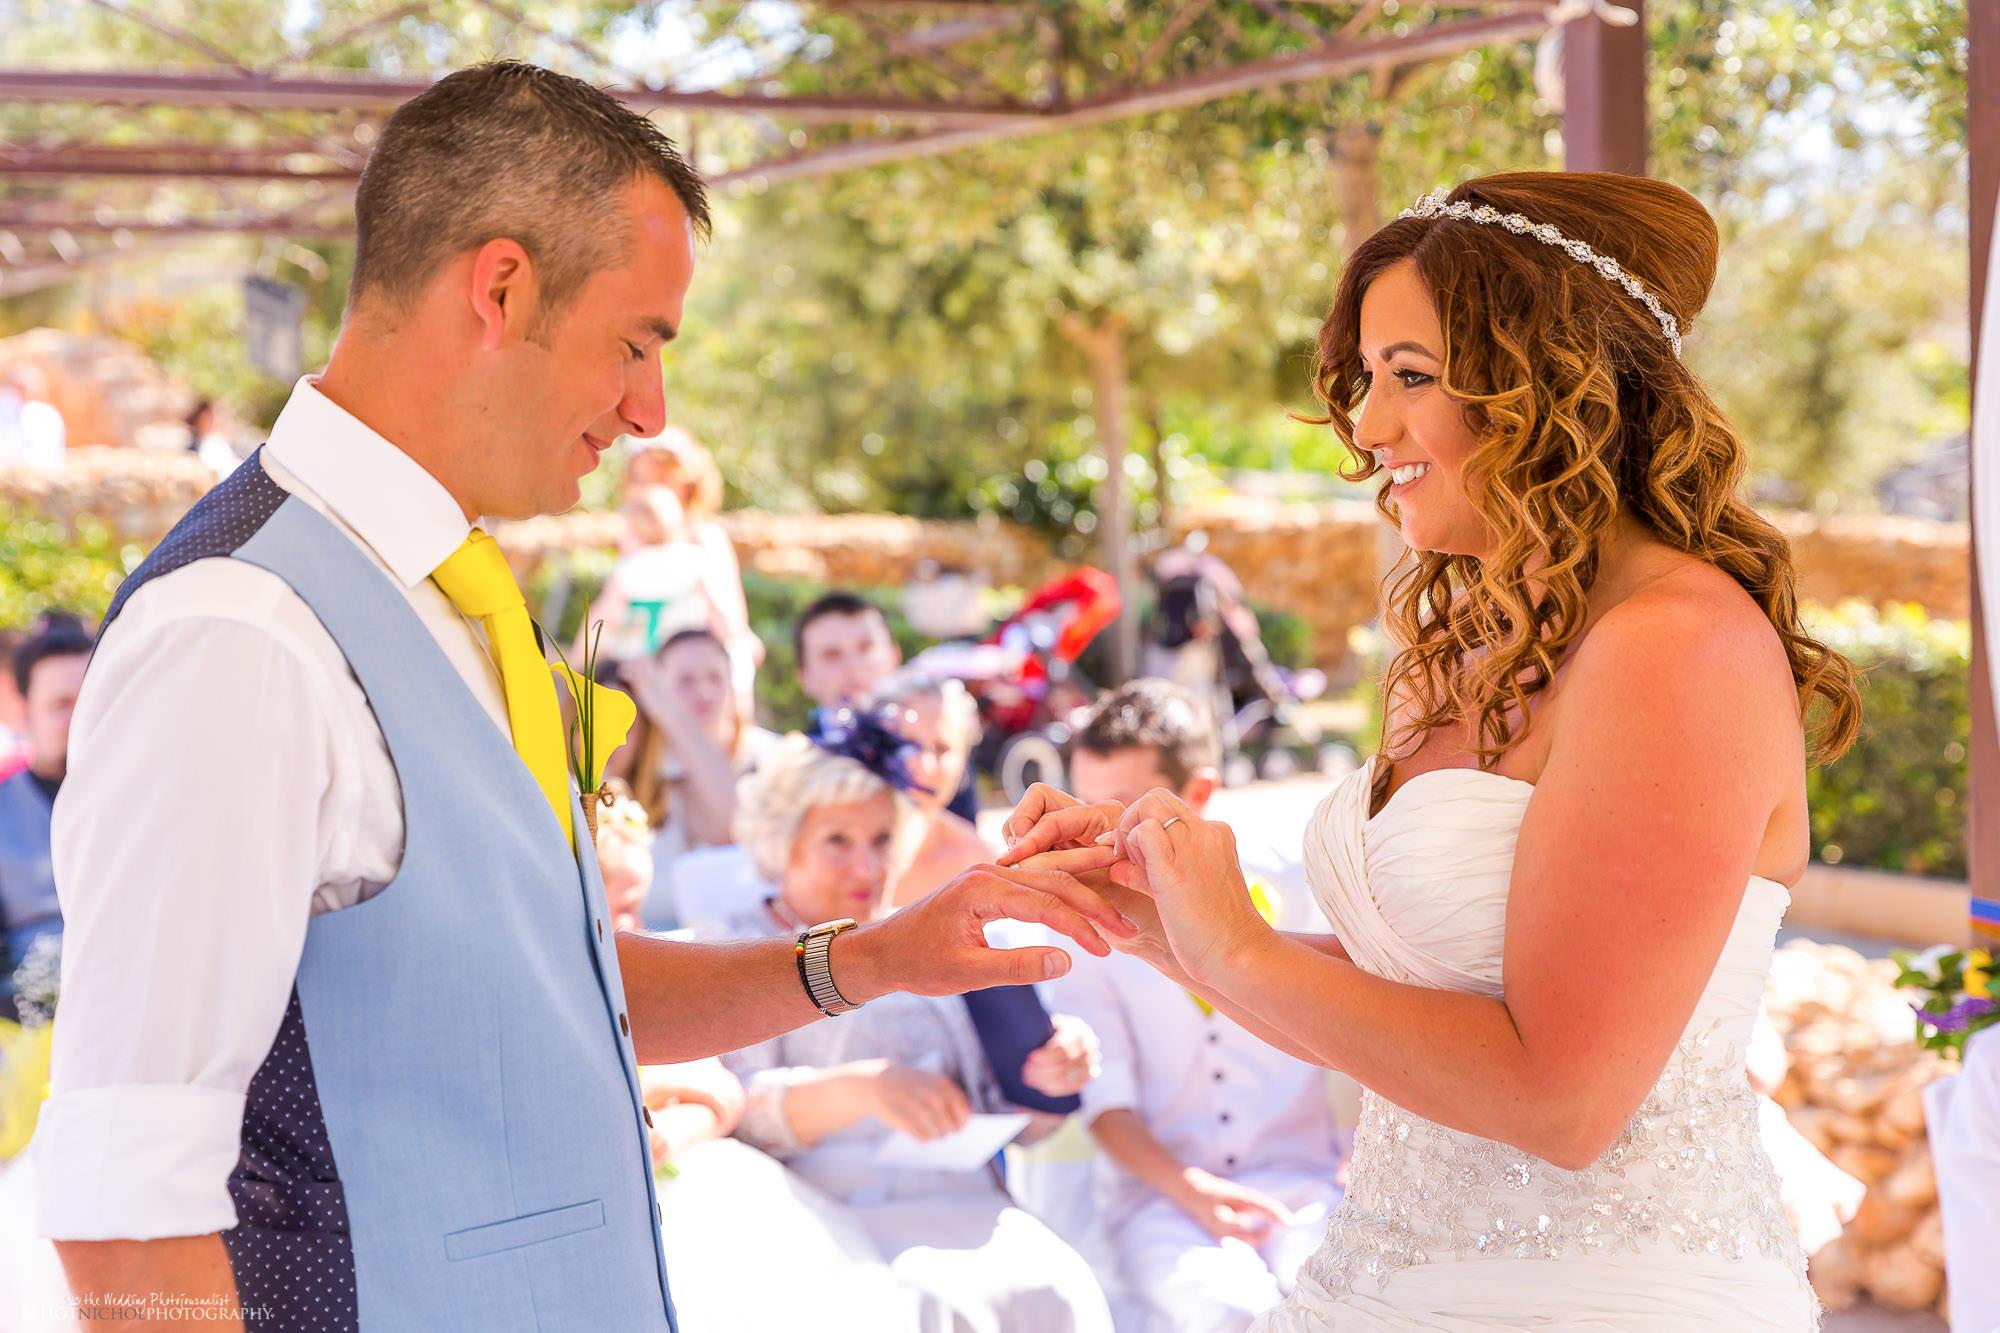 wedding-ceremony-photography-destination-bride-groom